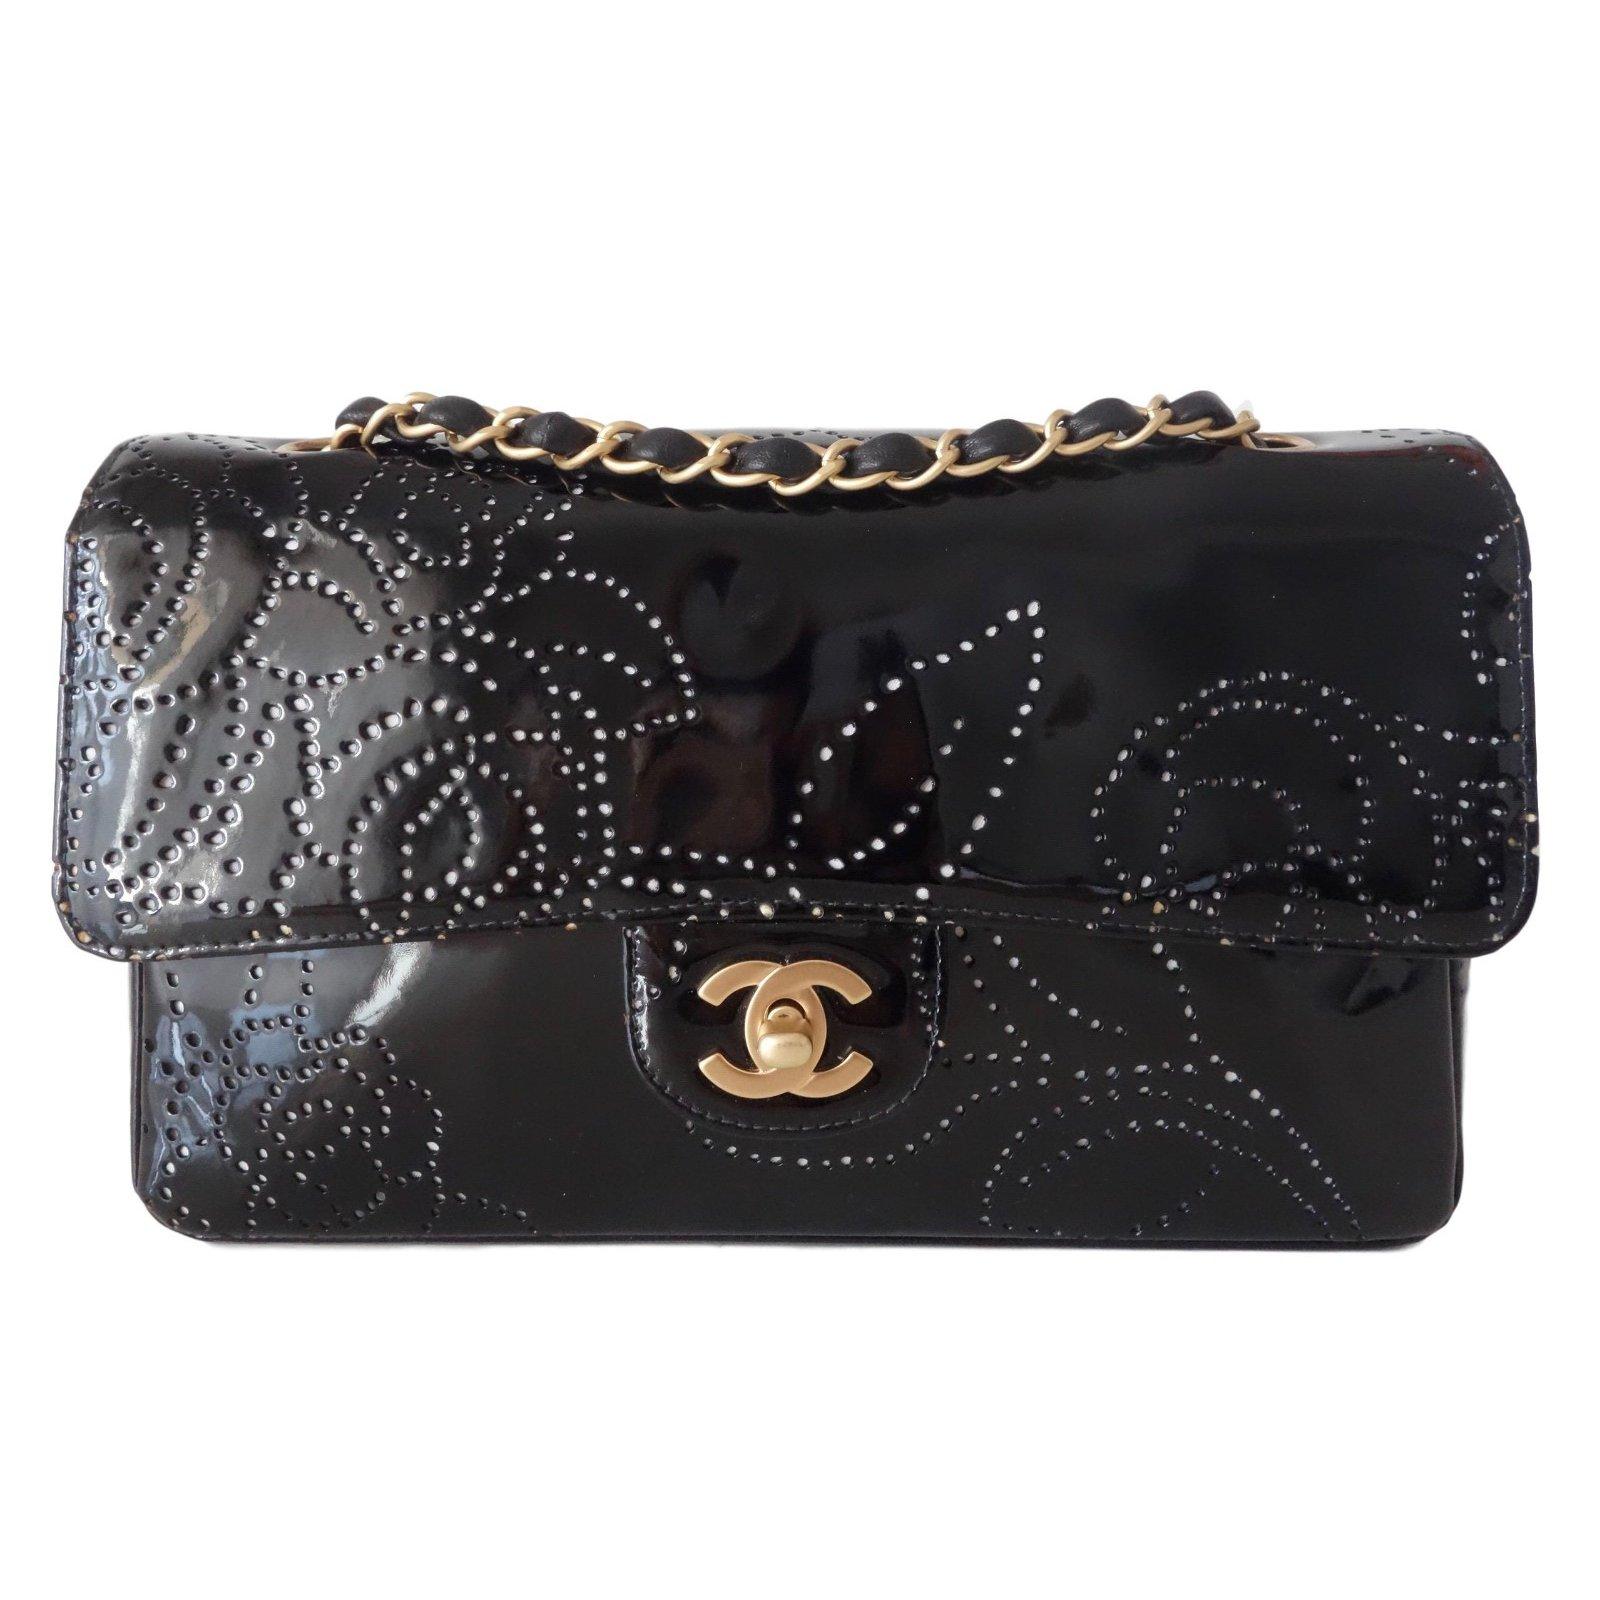 Sacs à main Chanel SAC CLASSIQUE CAMELIA Cuir vernis Noir ref.79968 . 6dd2ae3ab07